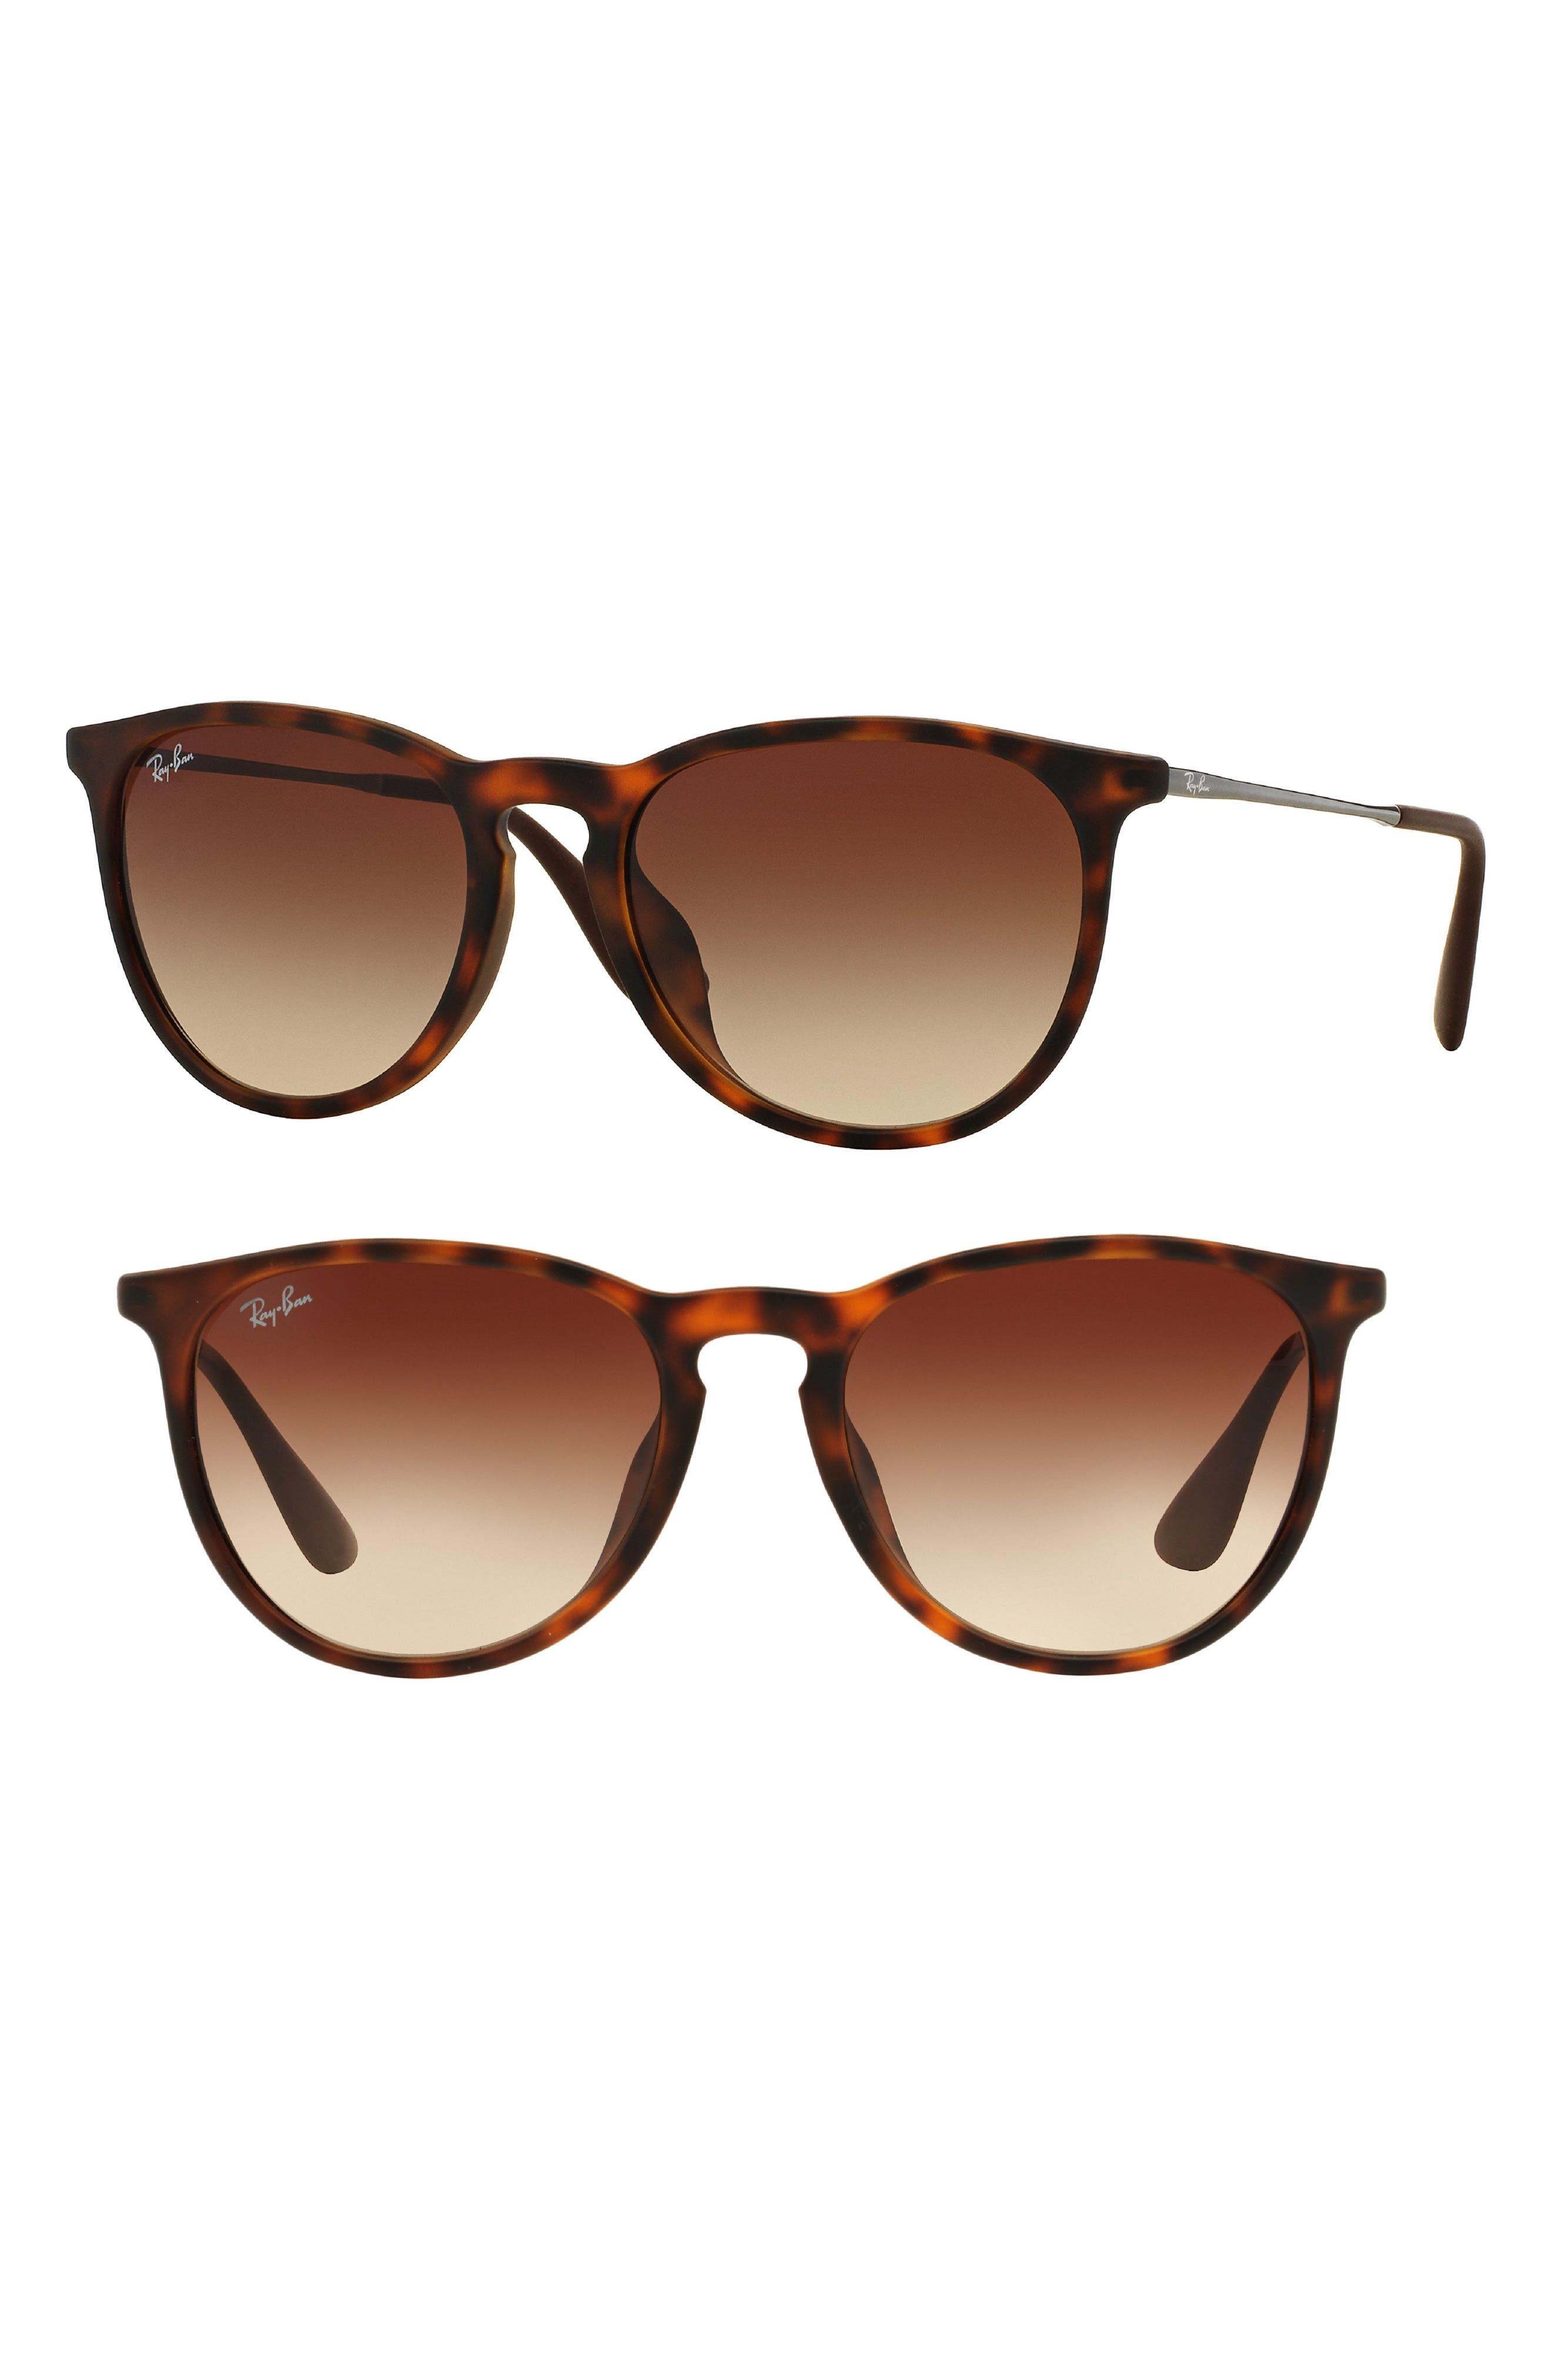 Erika 54mm Sunglasses,                         Main,                         color, Tortoise/ Silver